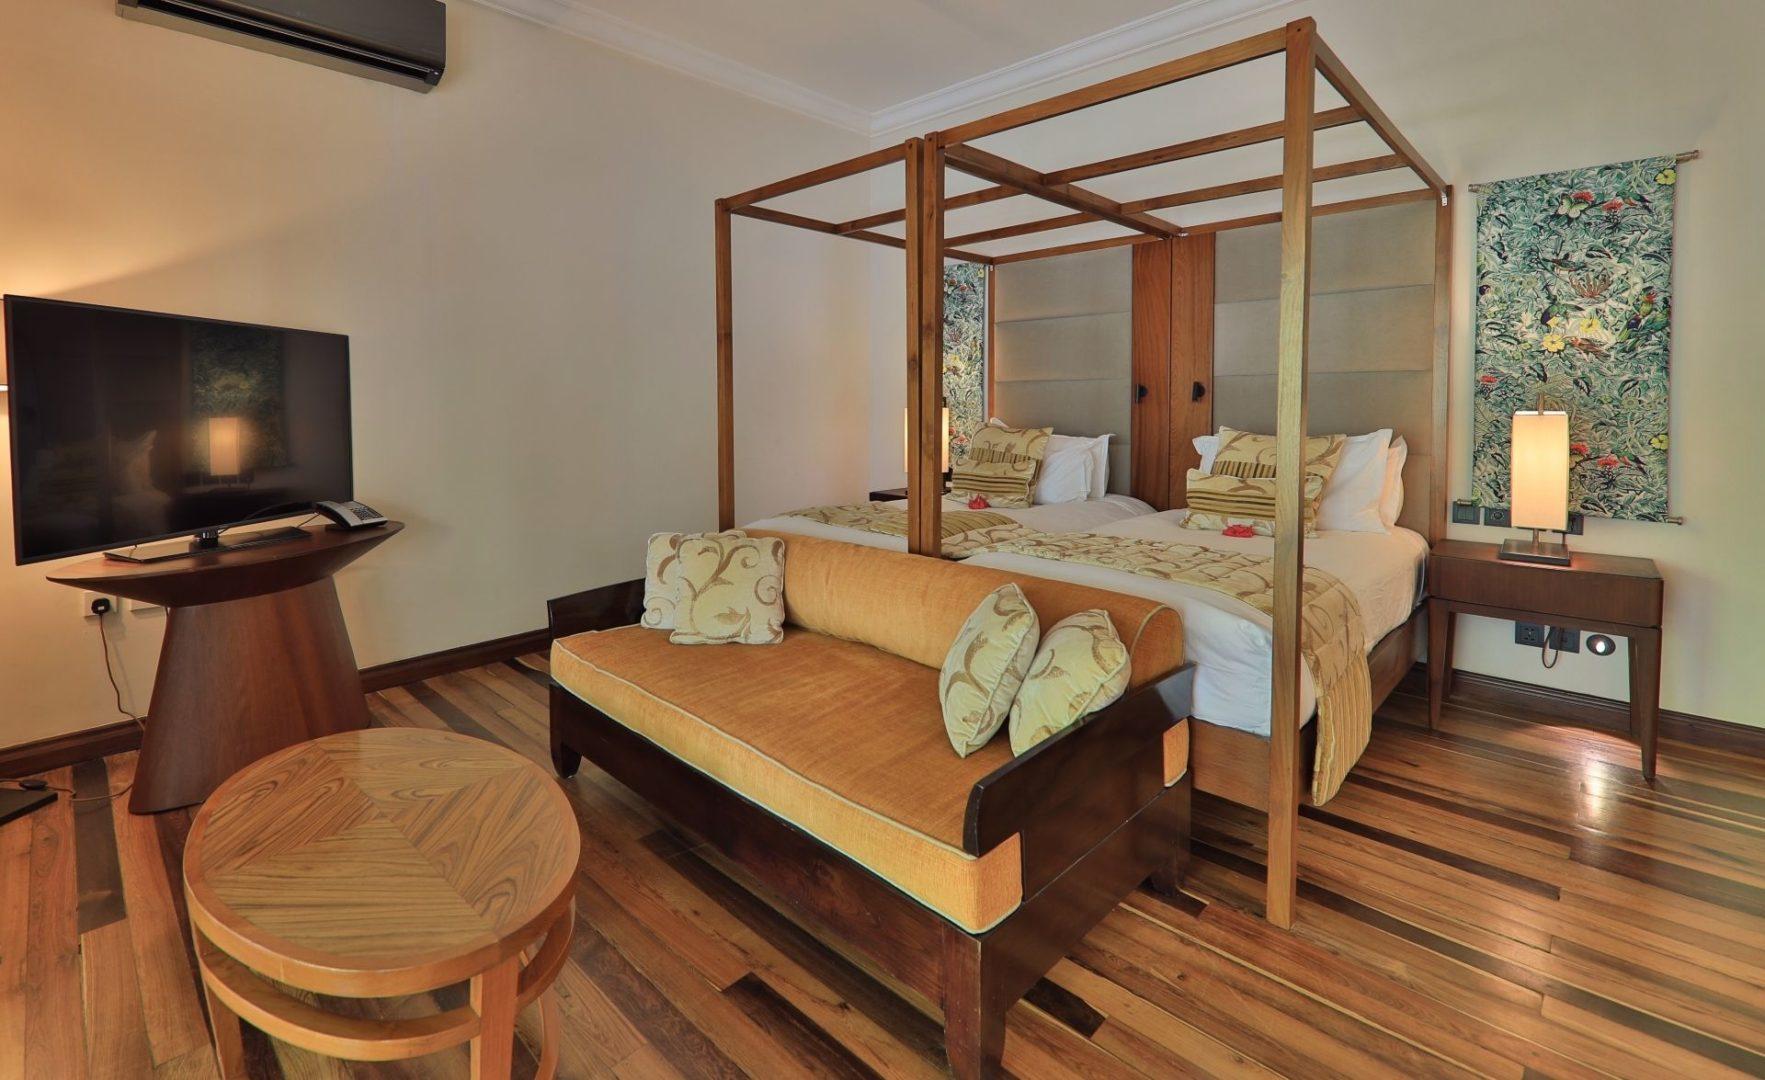 Presidential Suite Pool Villa – Main bedroom